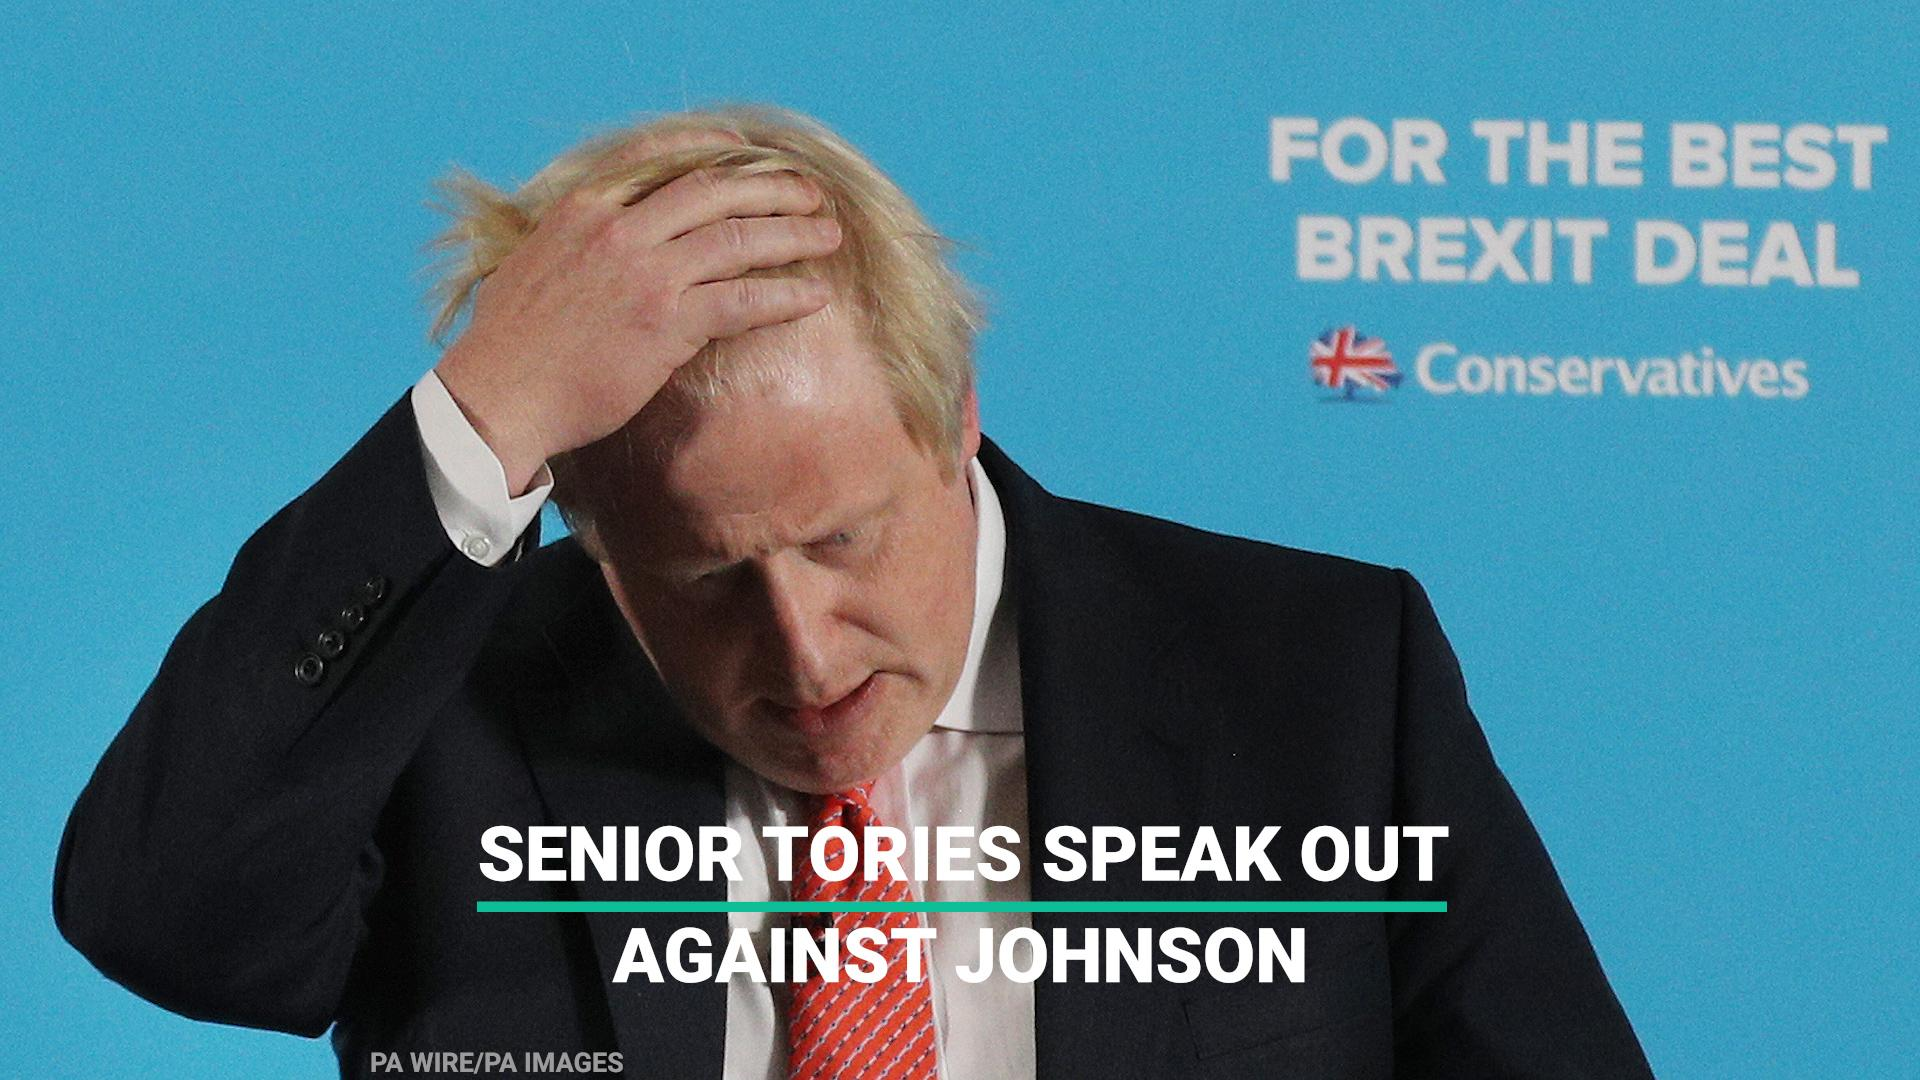 Boris Johnson's Burka Comments Split Tory Party As MP Warns Of Public's 'Despair'